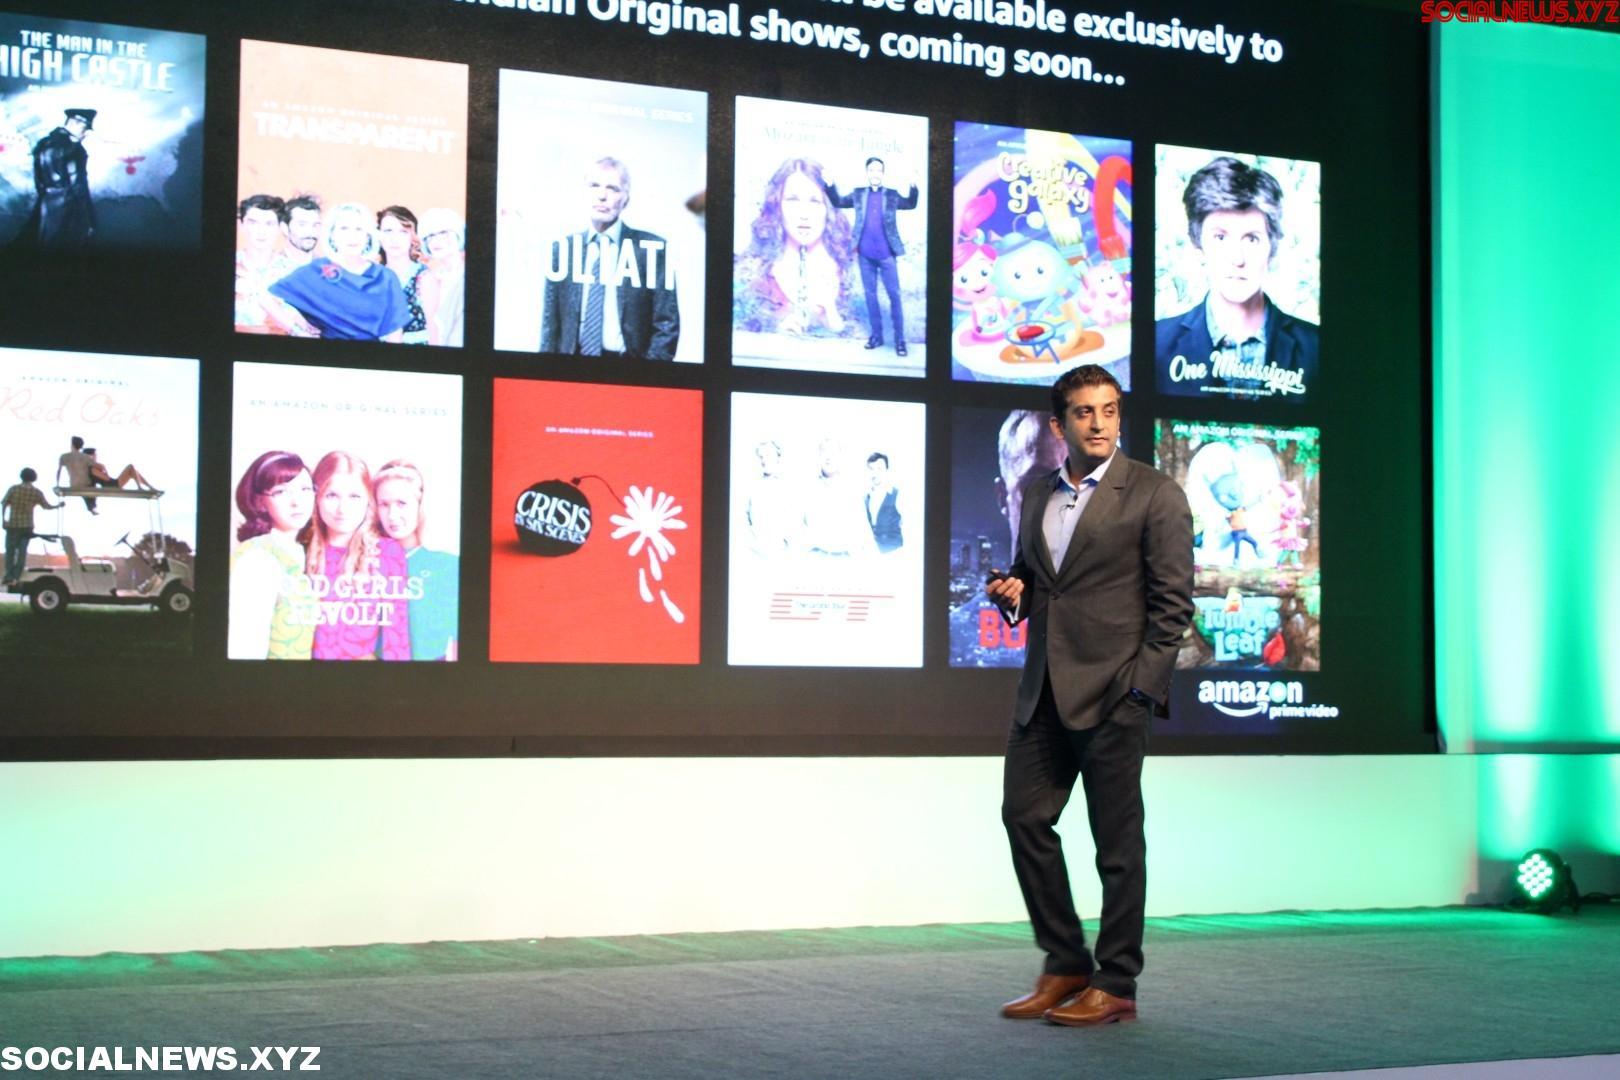 Amazon Prime Video to debut Spanish original series - Social